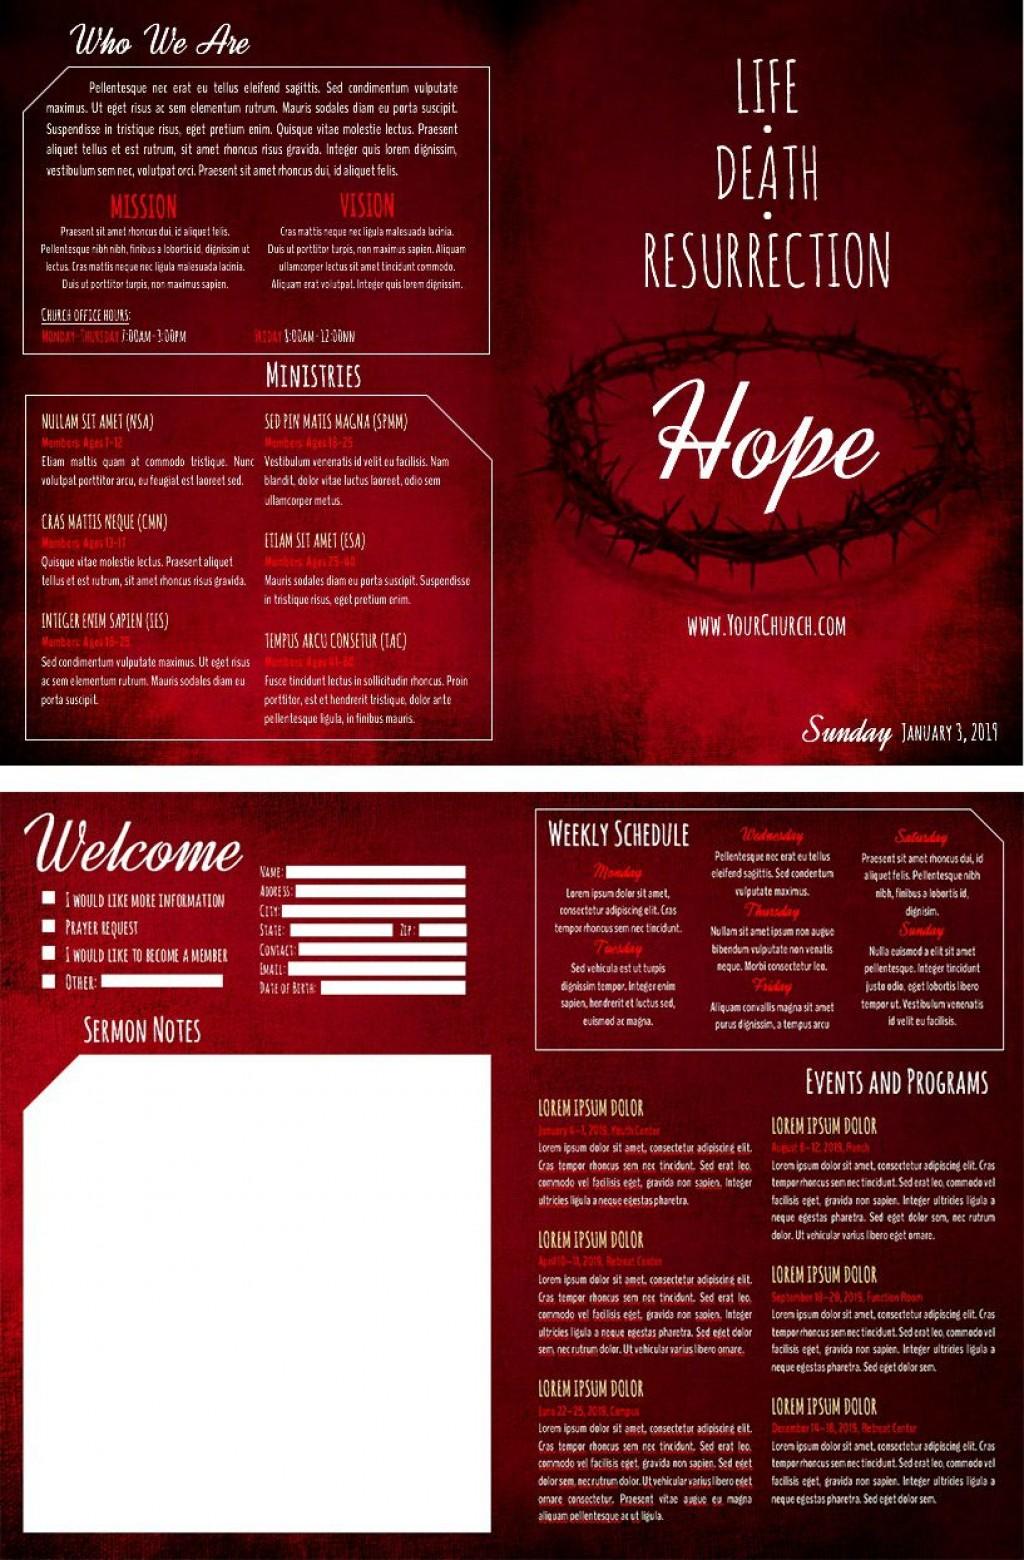 003 Stunning Free Church Program Template High Resolution  Printable Anniversary DocLarge